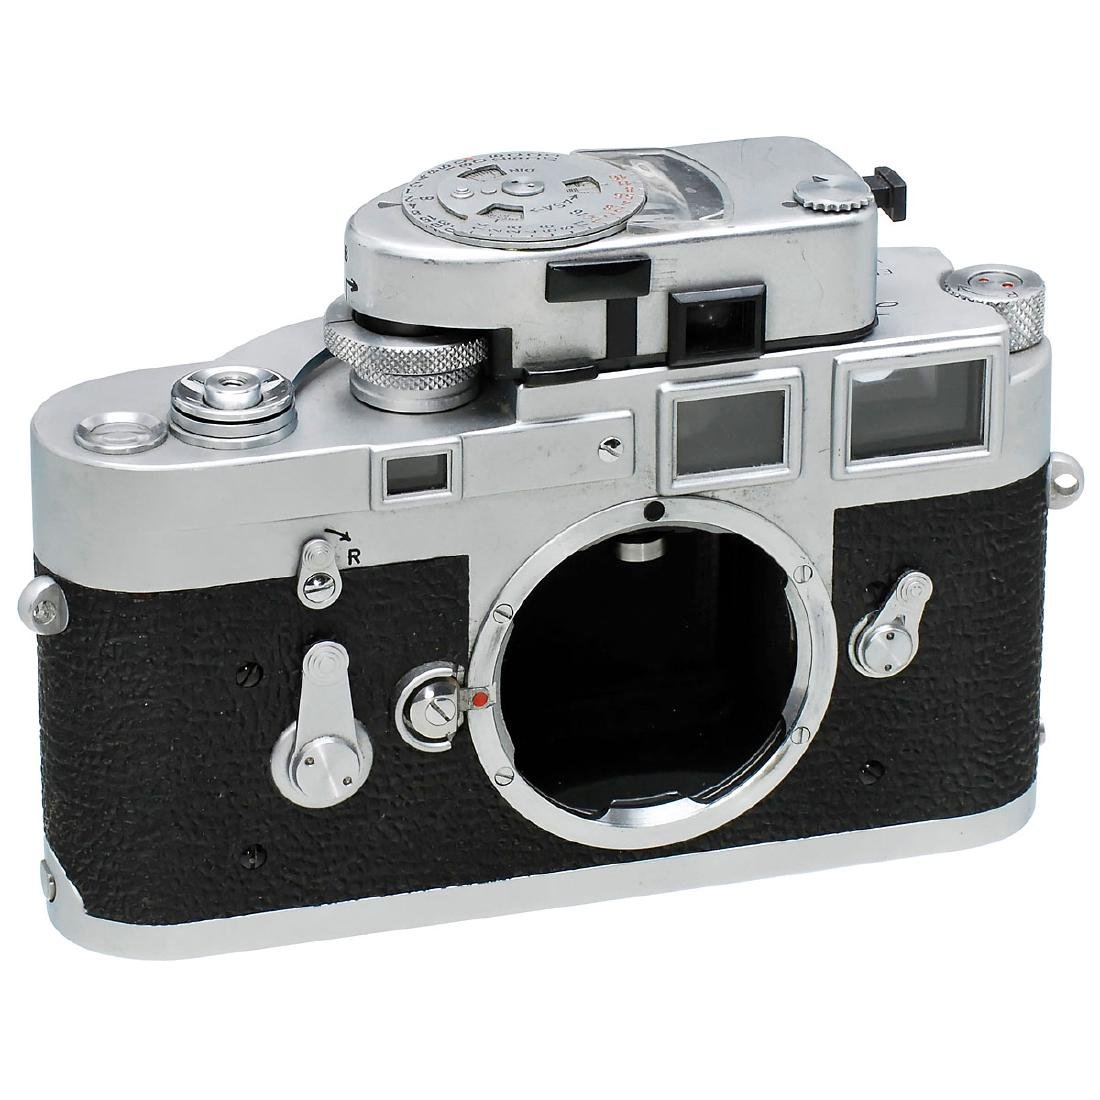 Leica M3 Body, 1963